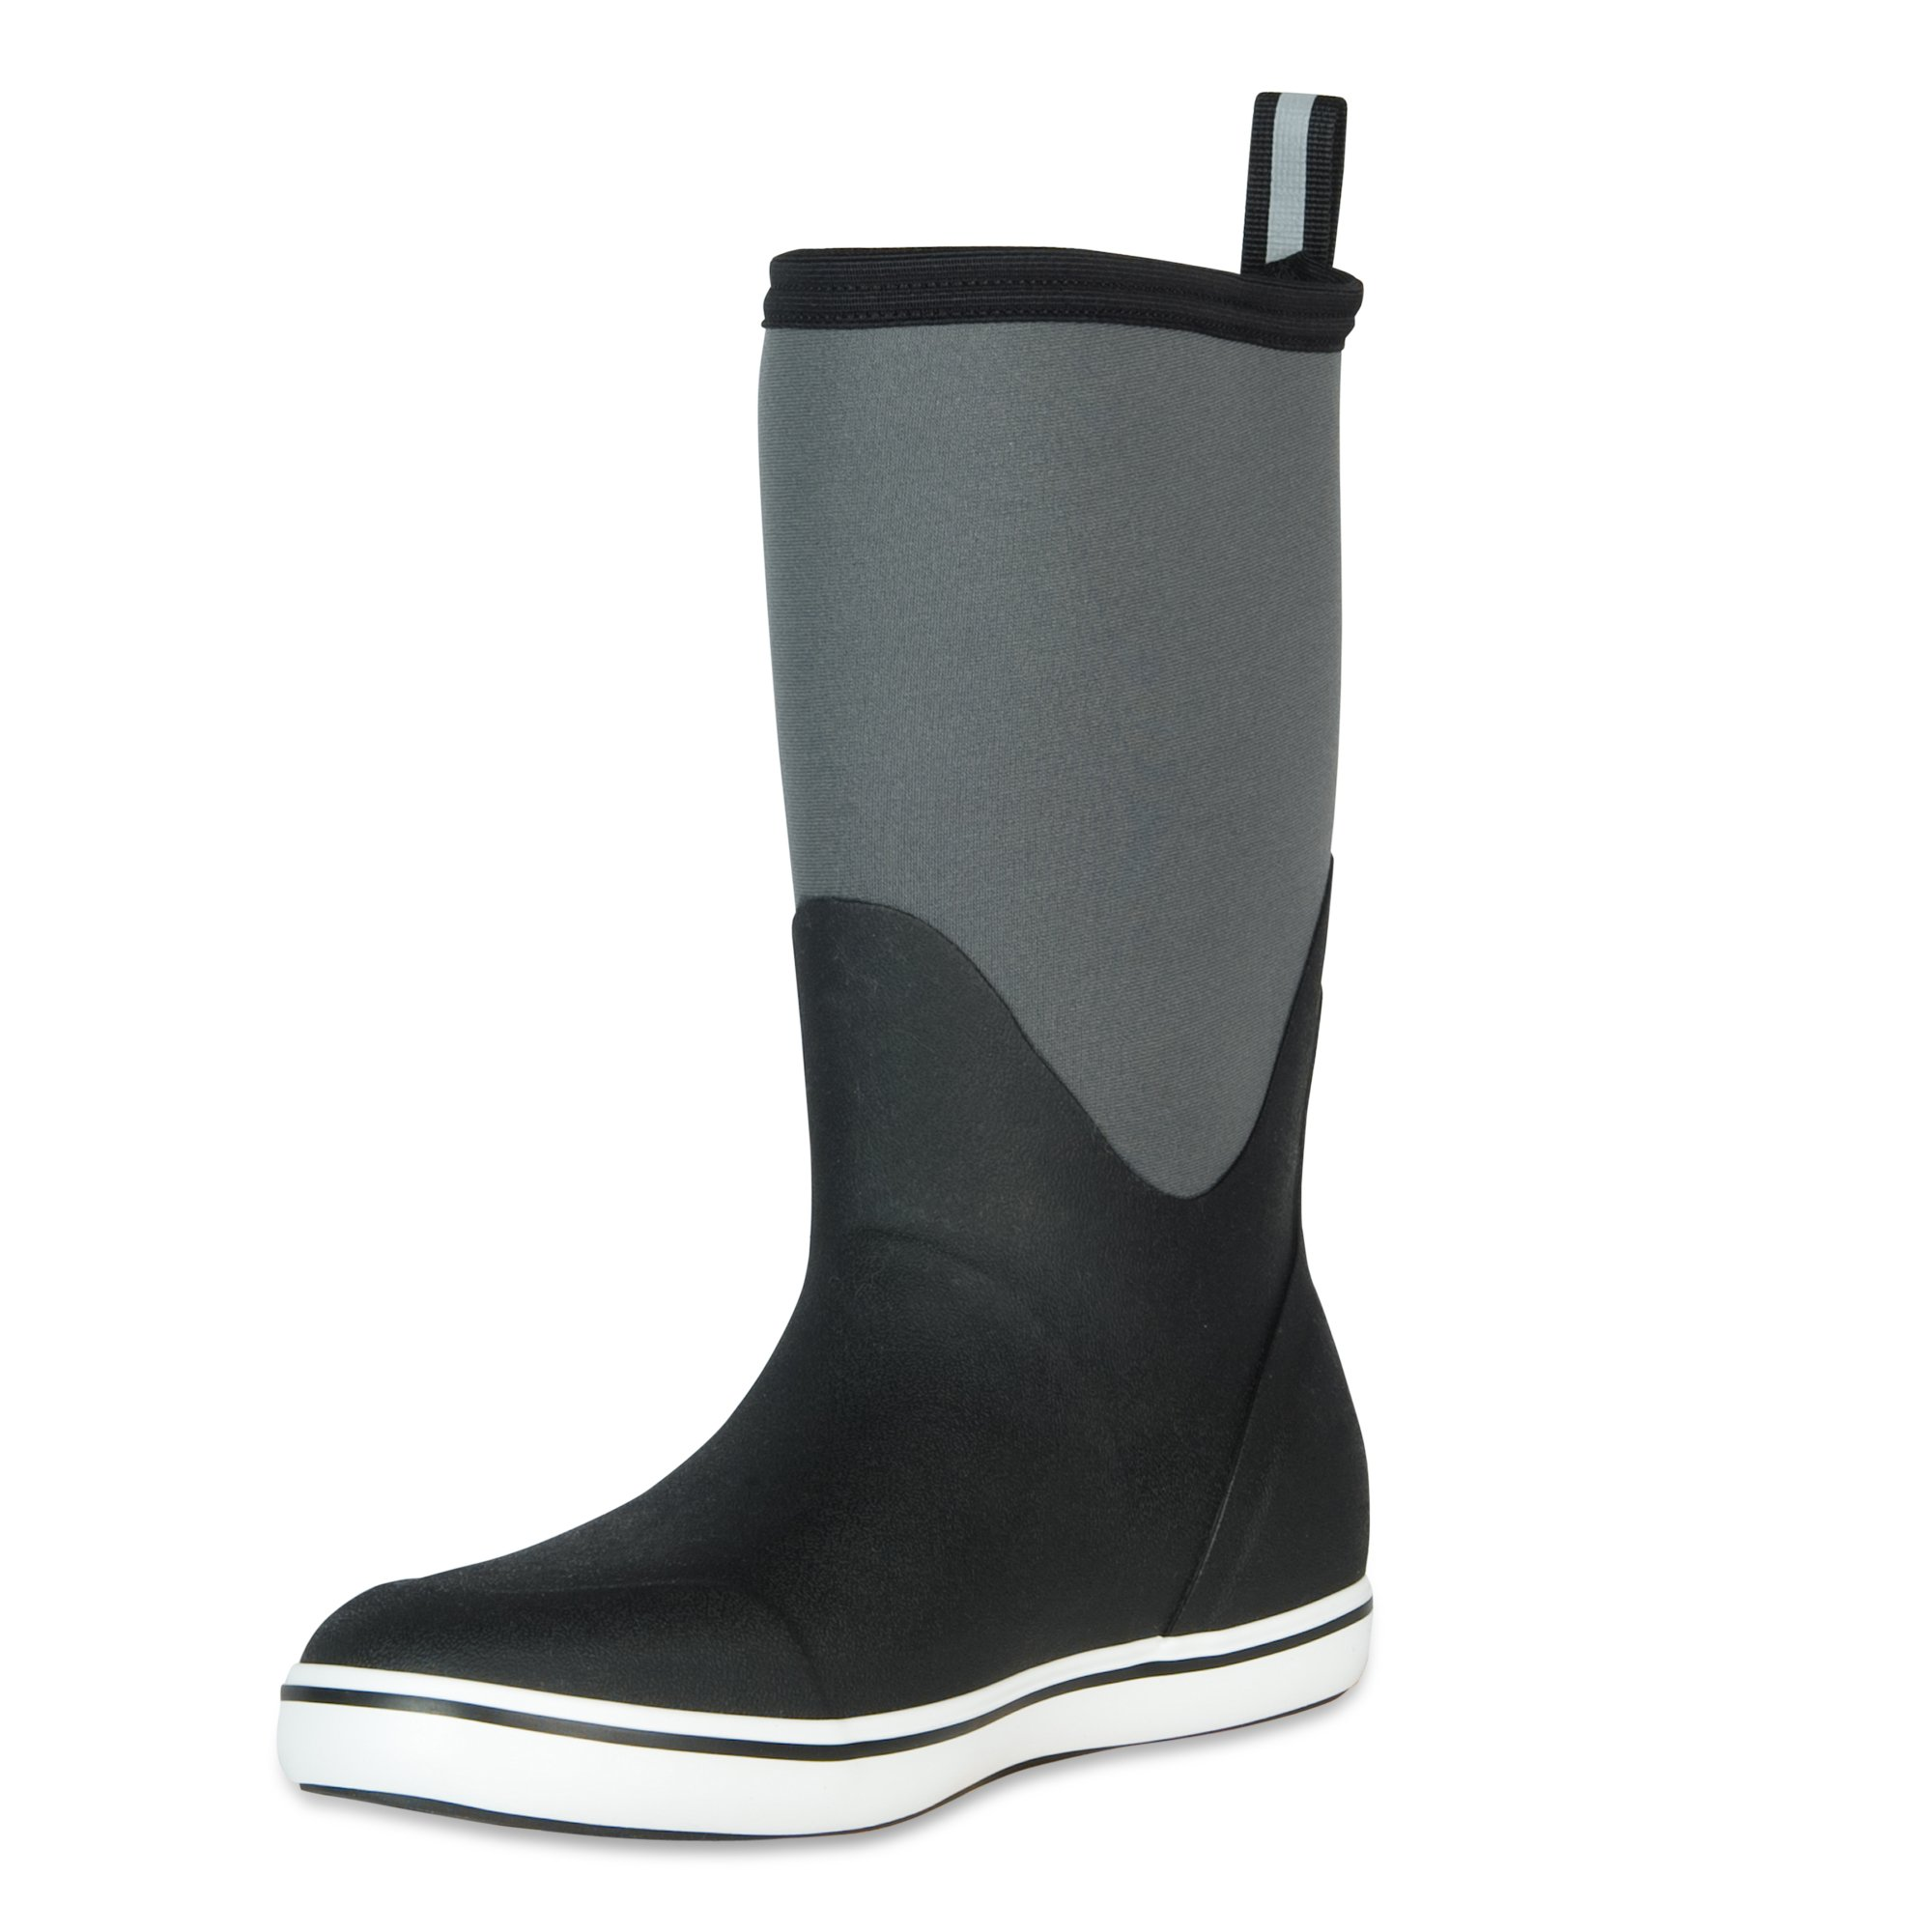 XTRATUF Performance Series 12'' Men's Neoprene & Rubber Deck Boots, Black & Castle Rock (22603)